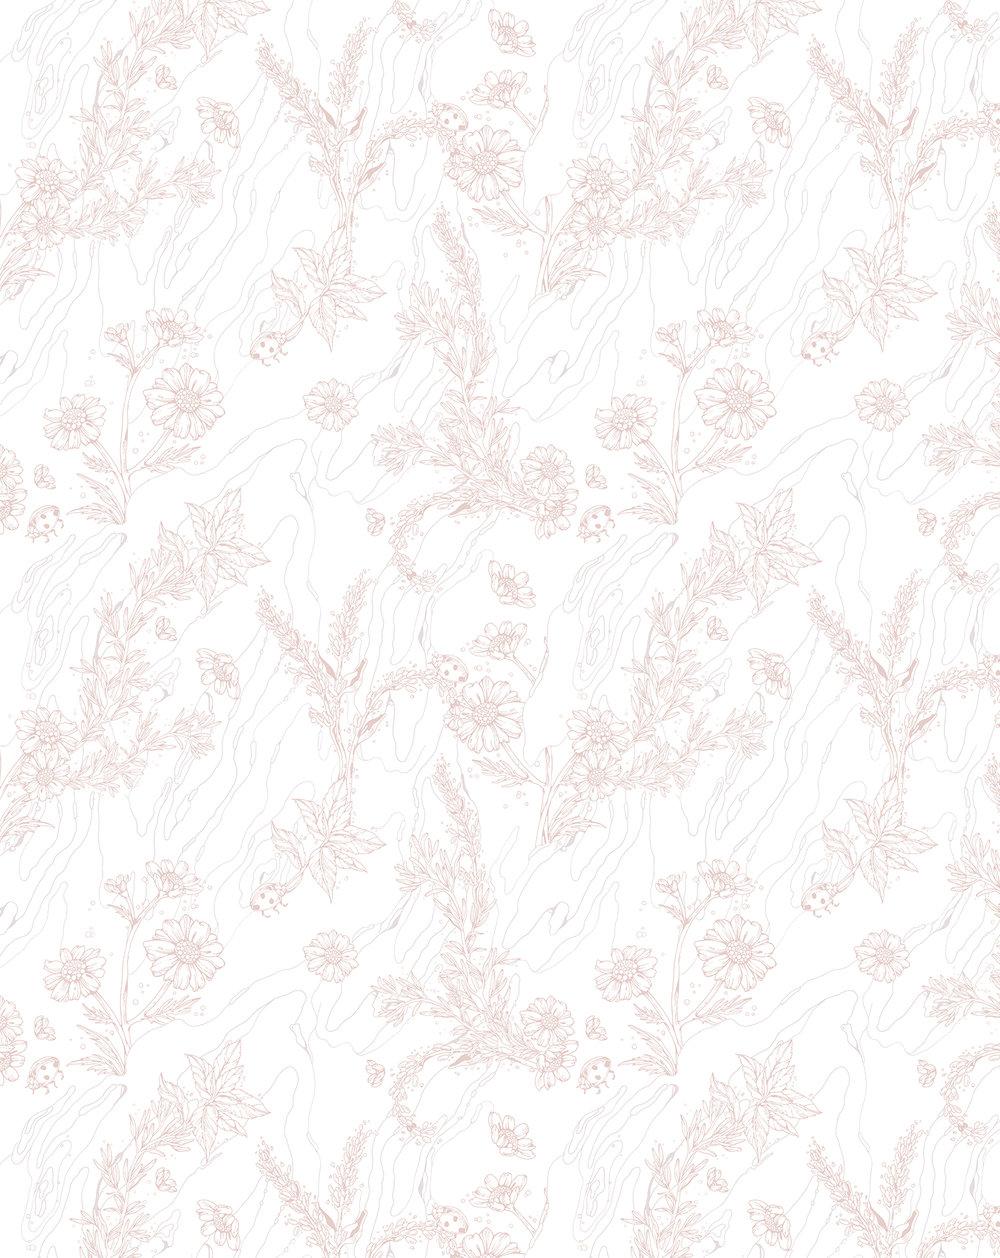 PommeChan_Sagitta2_Pattern.jpg